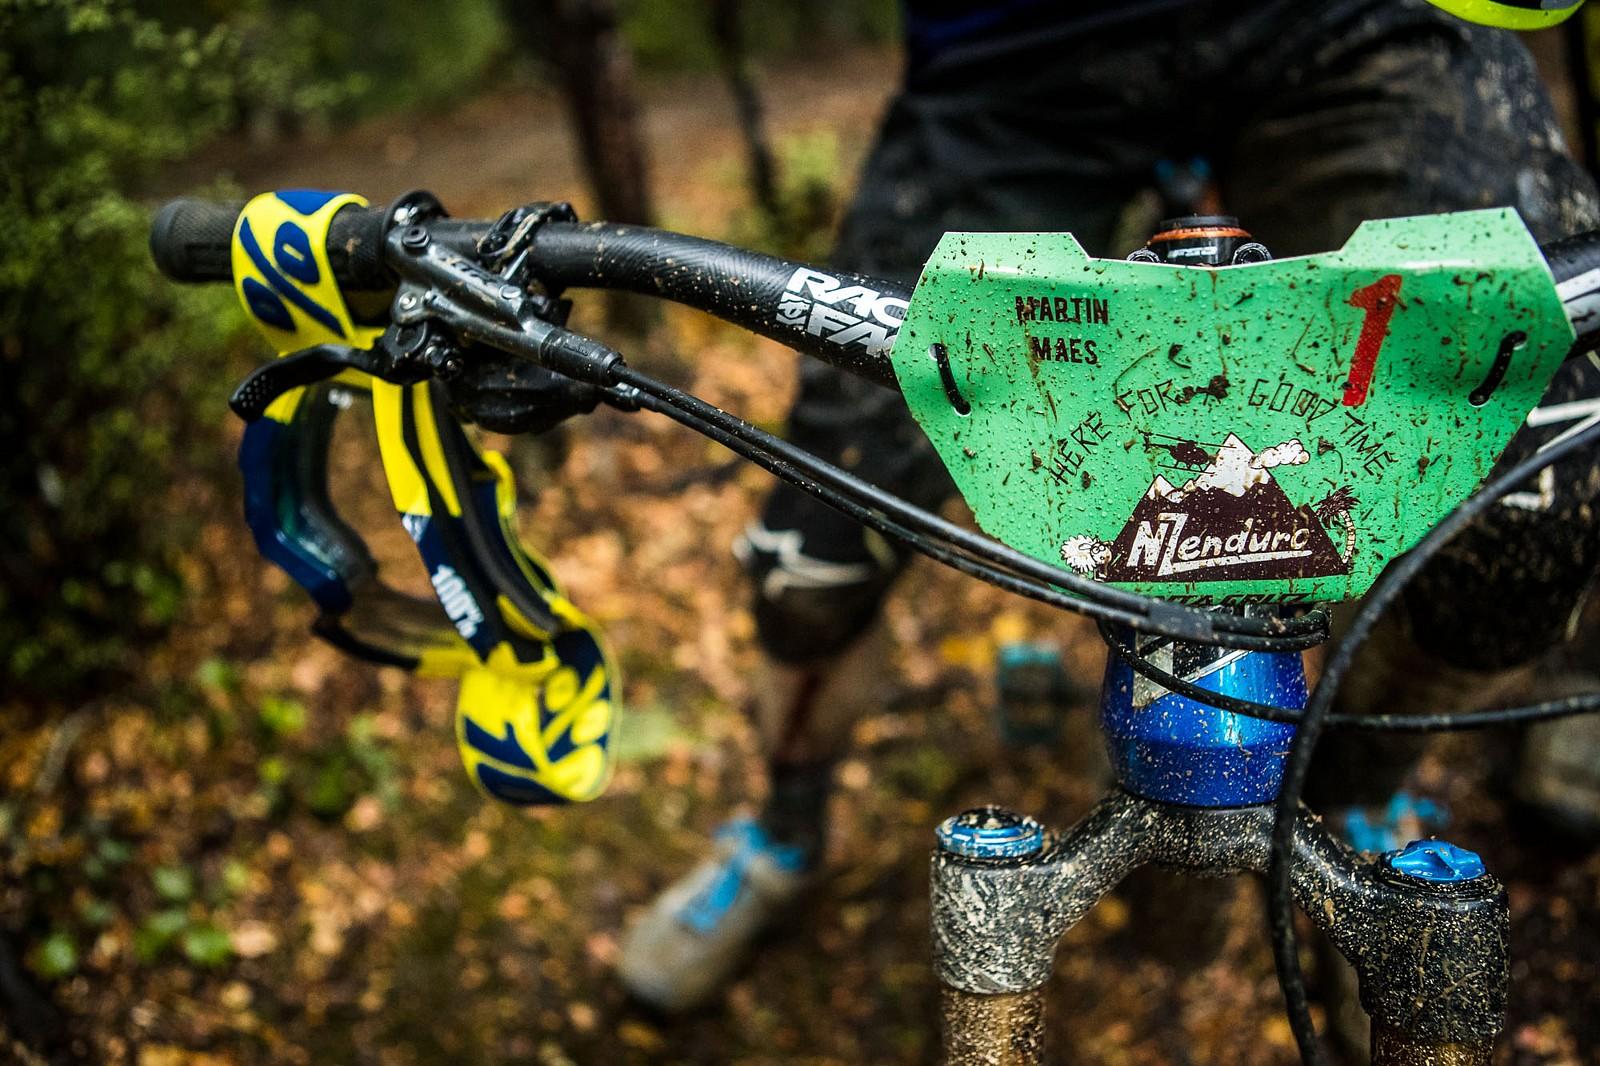 NZEnduro19 BB AS6I0305 - 2019 NZ Enduro Day 1 Photo Gallery - Mountain Biking Pictures - Vital MTB